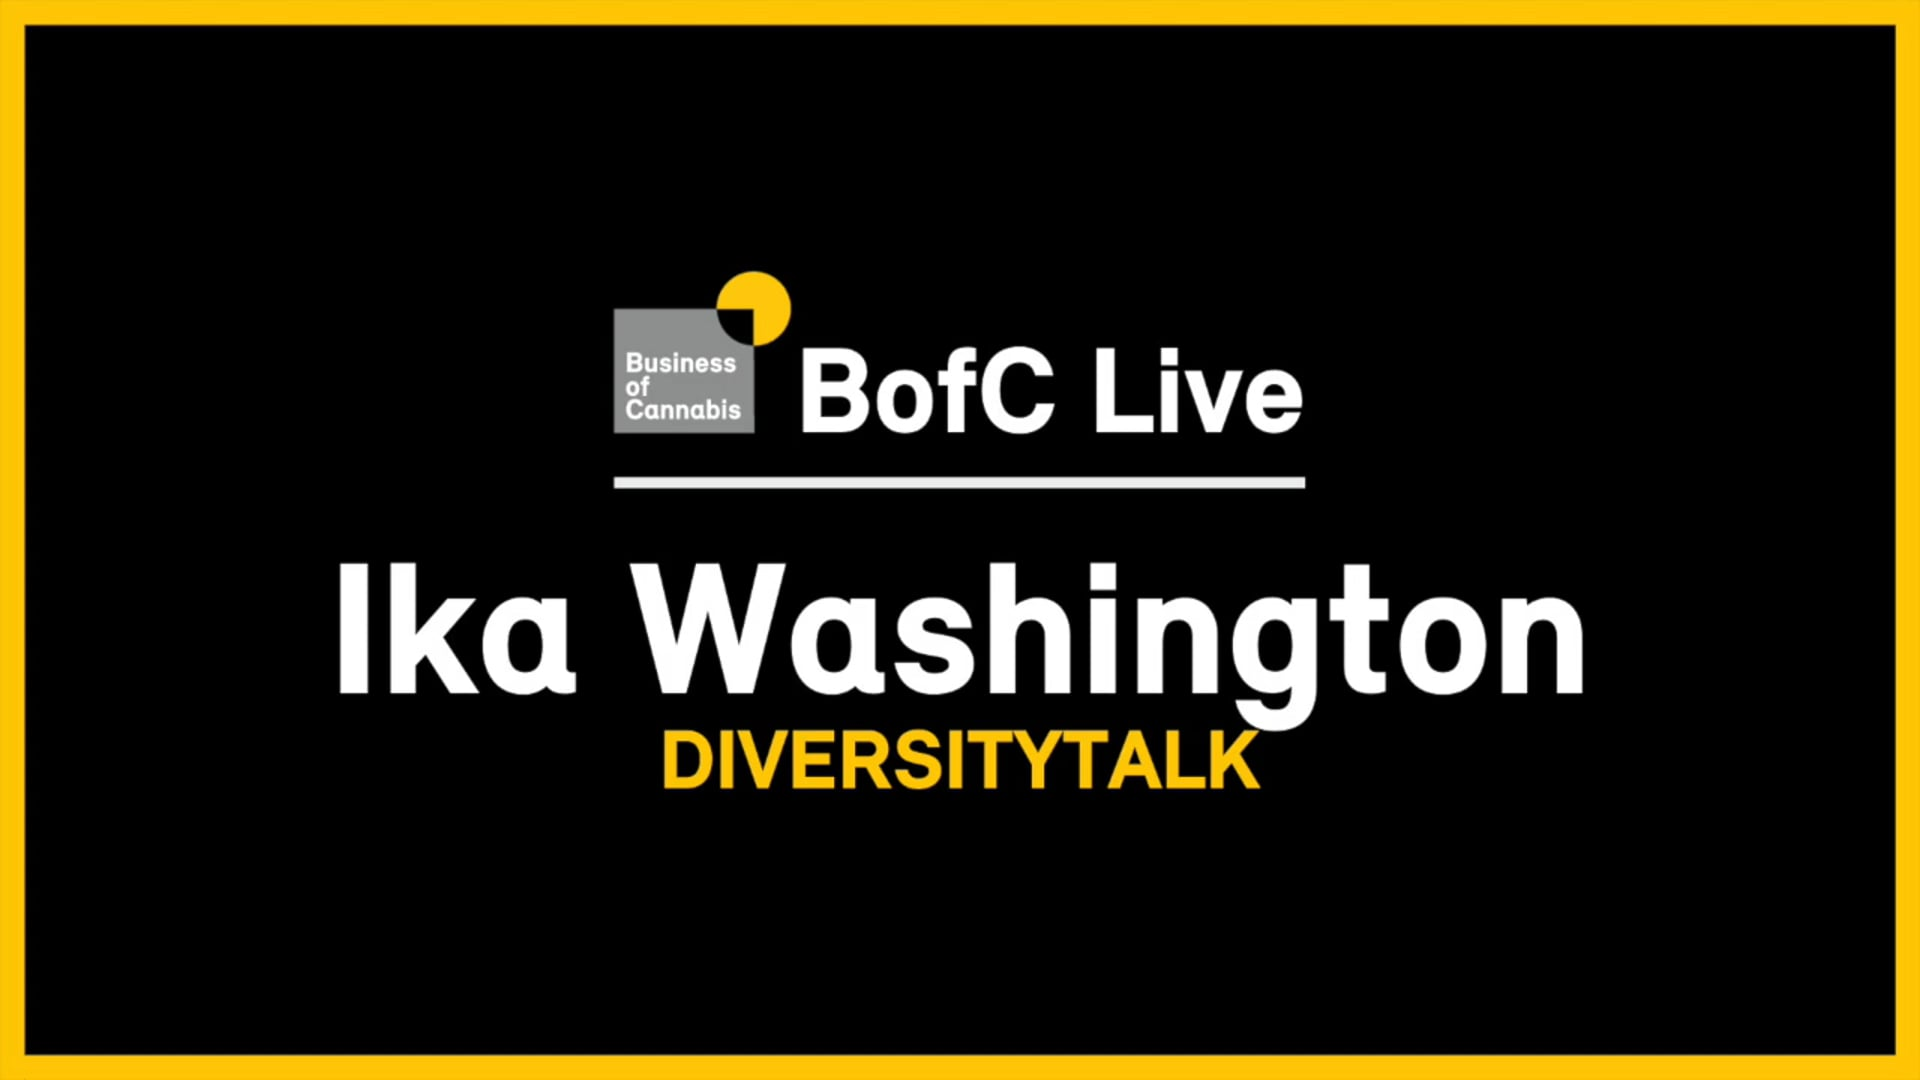 July 14, 2020 | BofC Live with Ika Washington, DiversityTalk